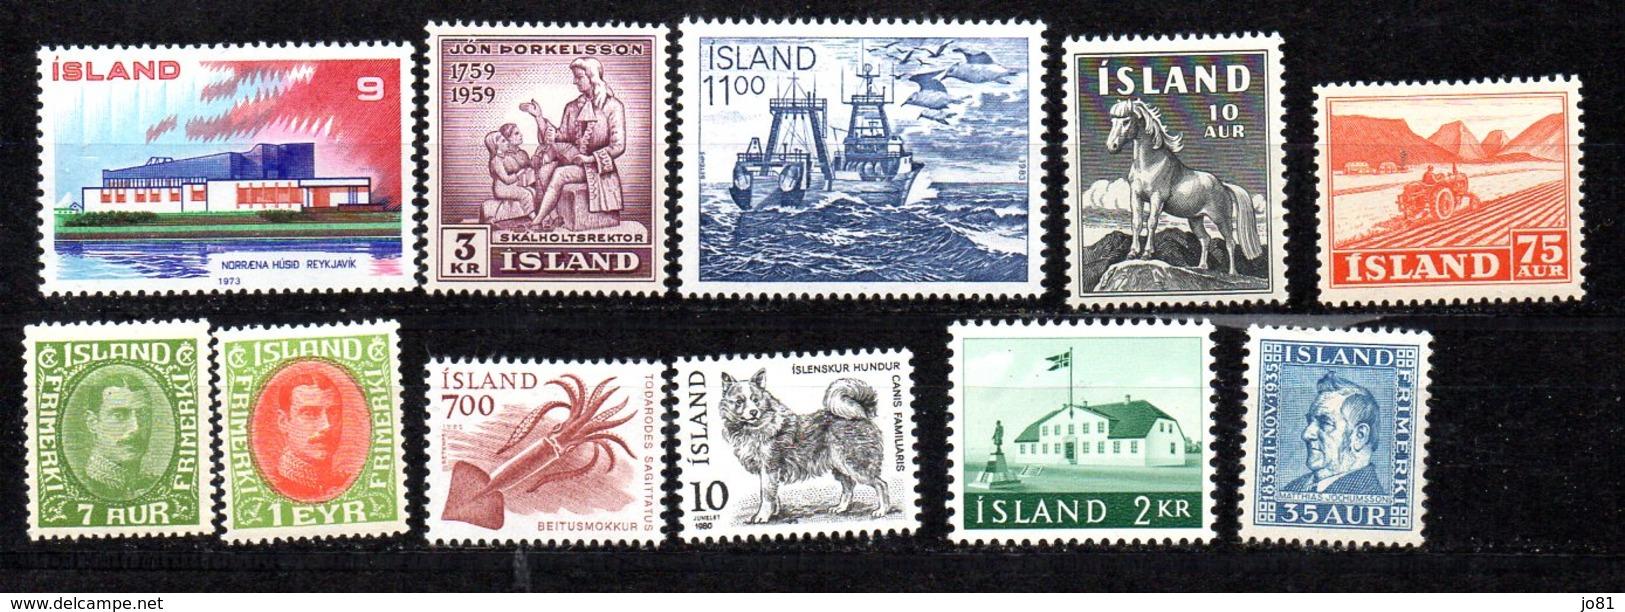 Islande Lot De Timbres XX/MNH - Islande